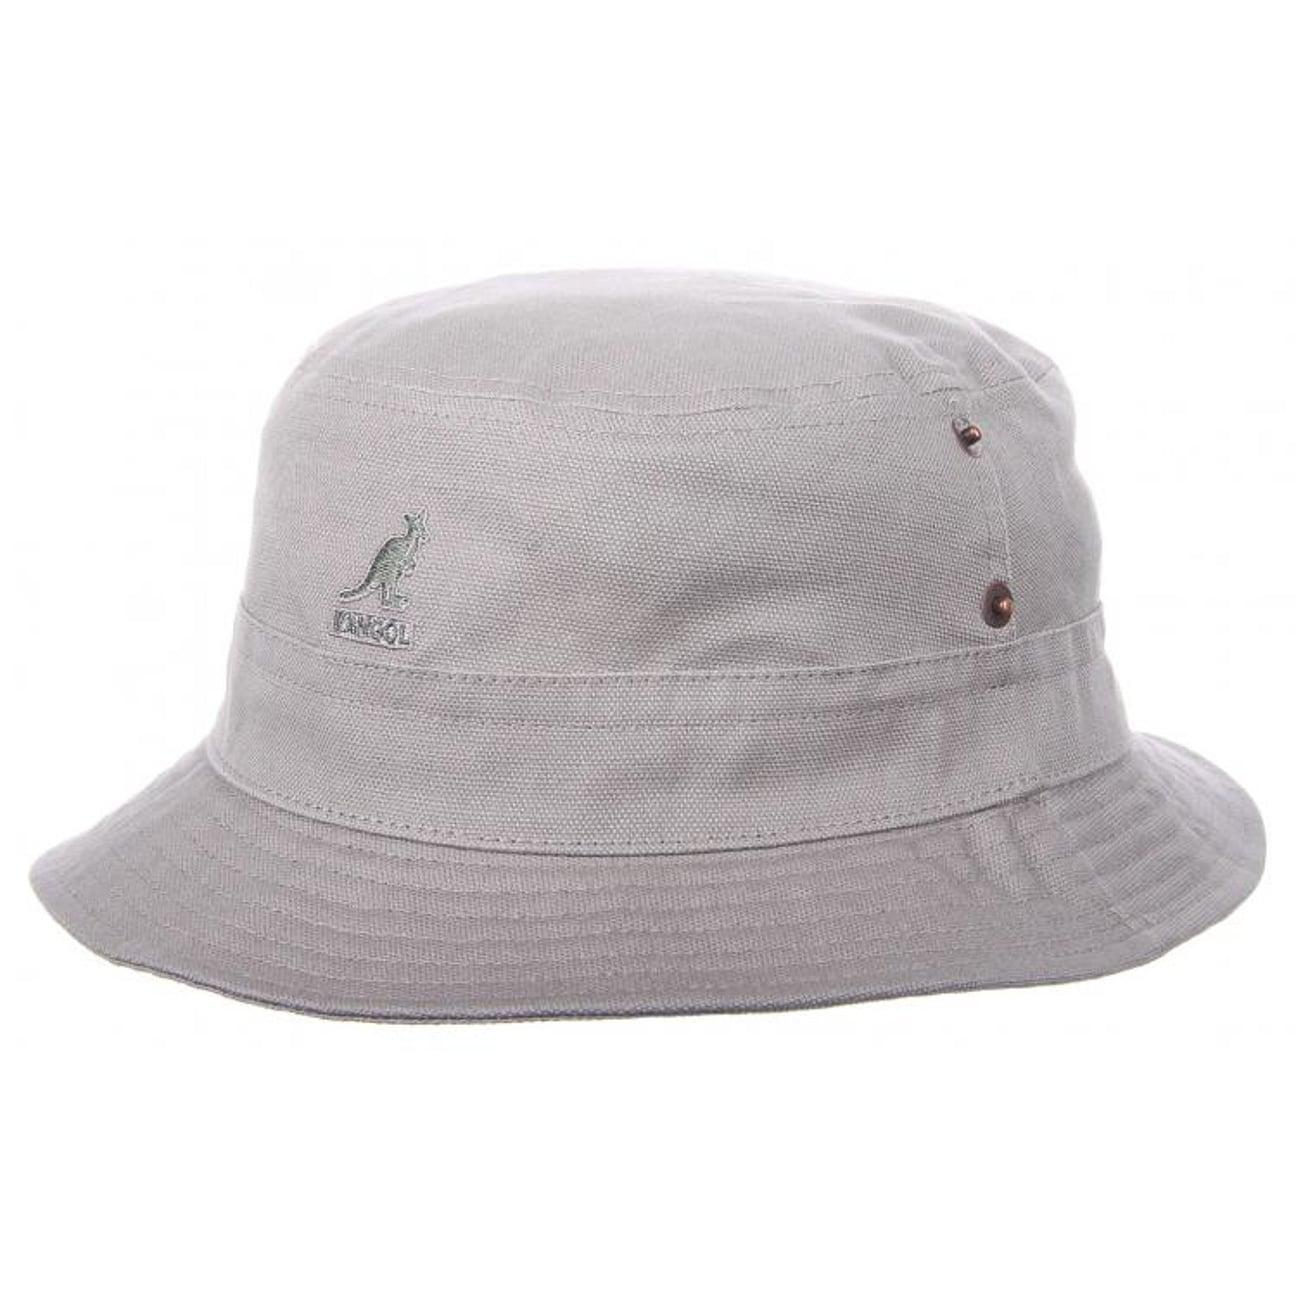 Canvas Lahinch Bucket Hat by Kangol - khaki 1 ... 9604063363c